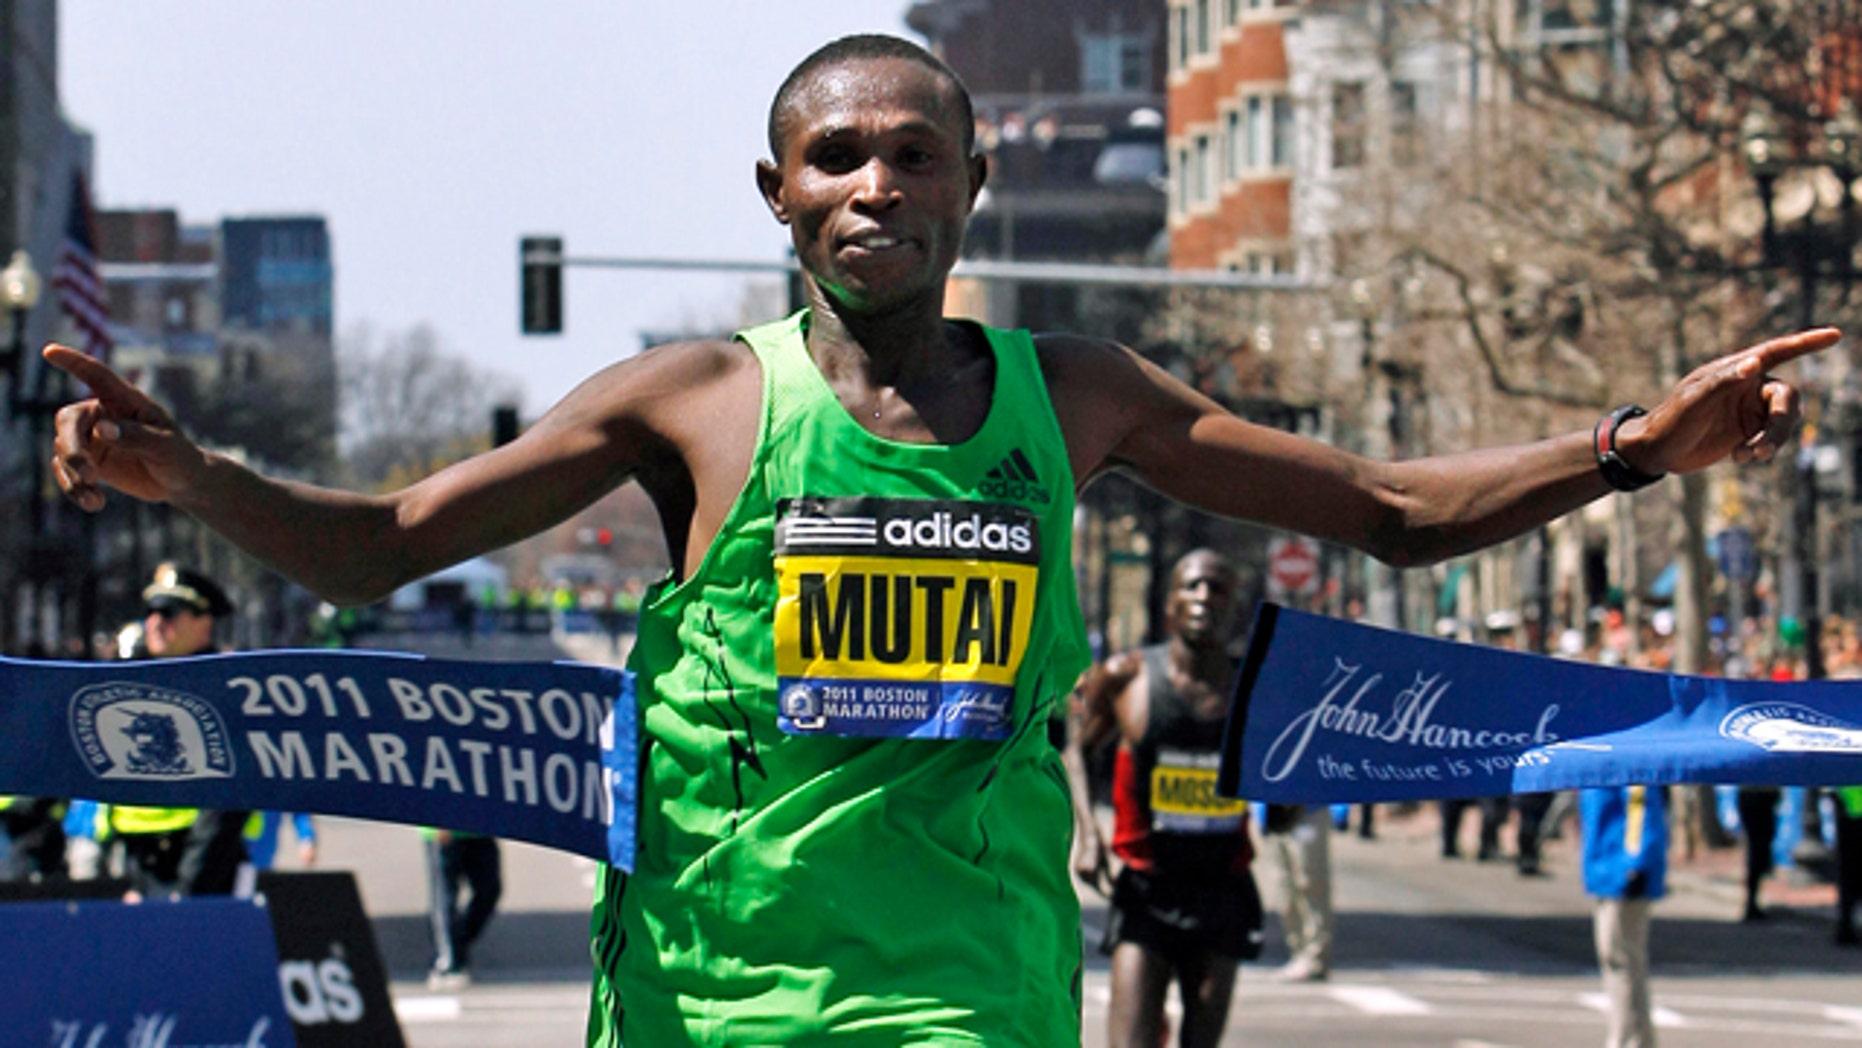 April 18, 2011: Winner Geoffrey Mutai of Kenya crosses the finish line of the 115th Boston Marathon.